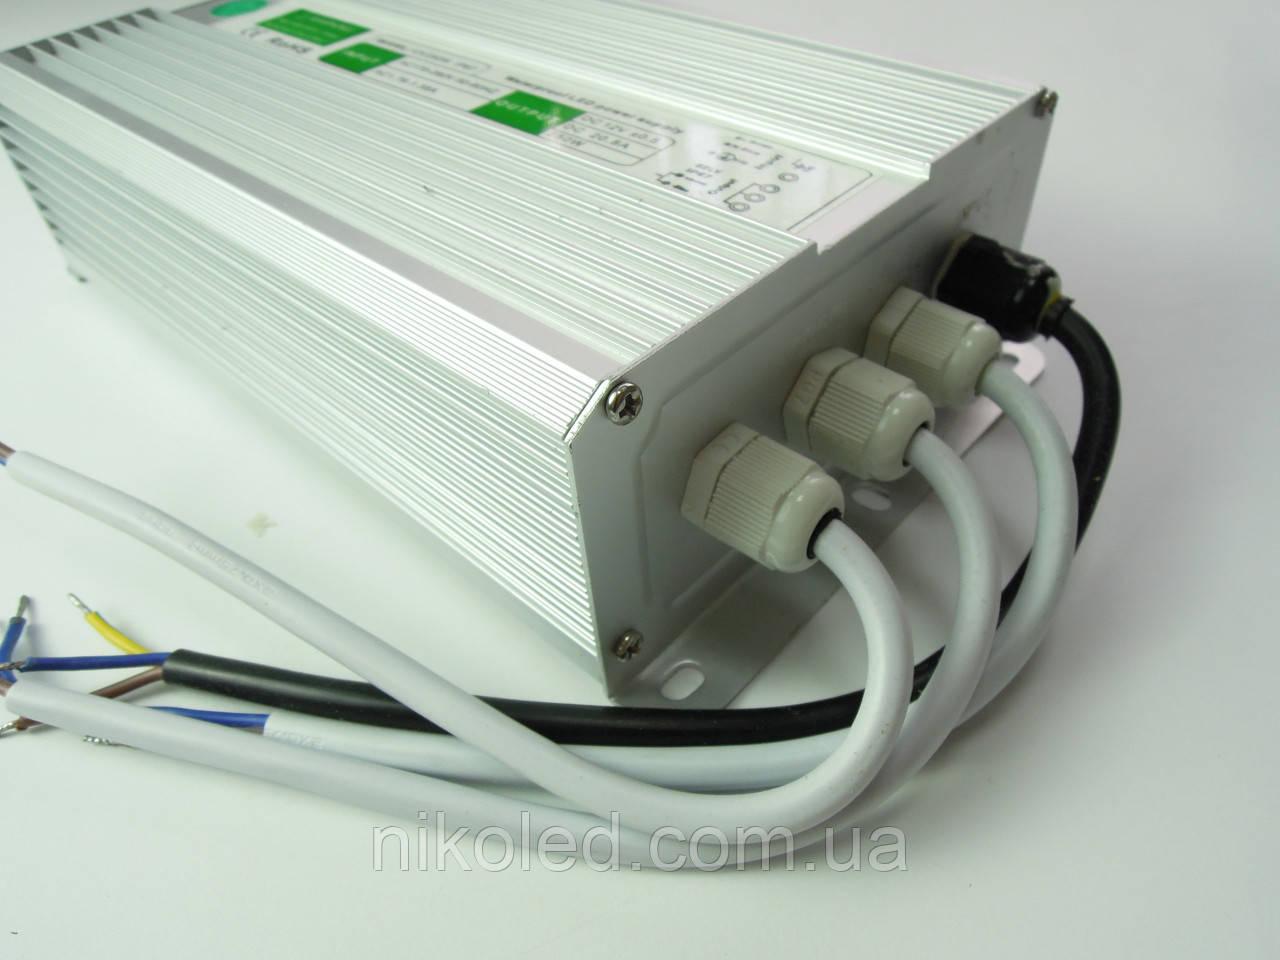 Блок живлення герметичний 220VAC 12VDC 20.8 A